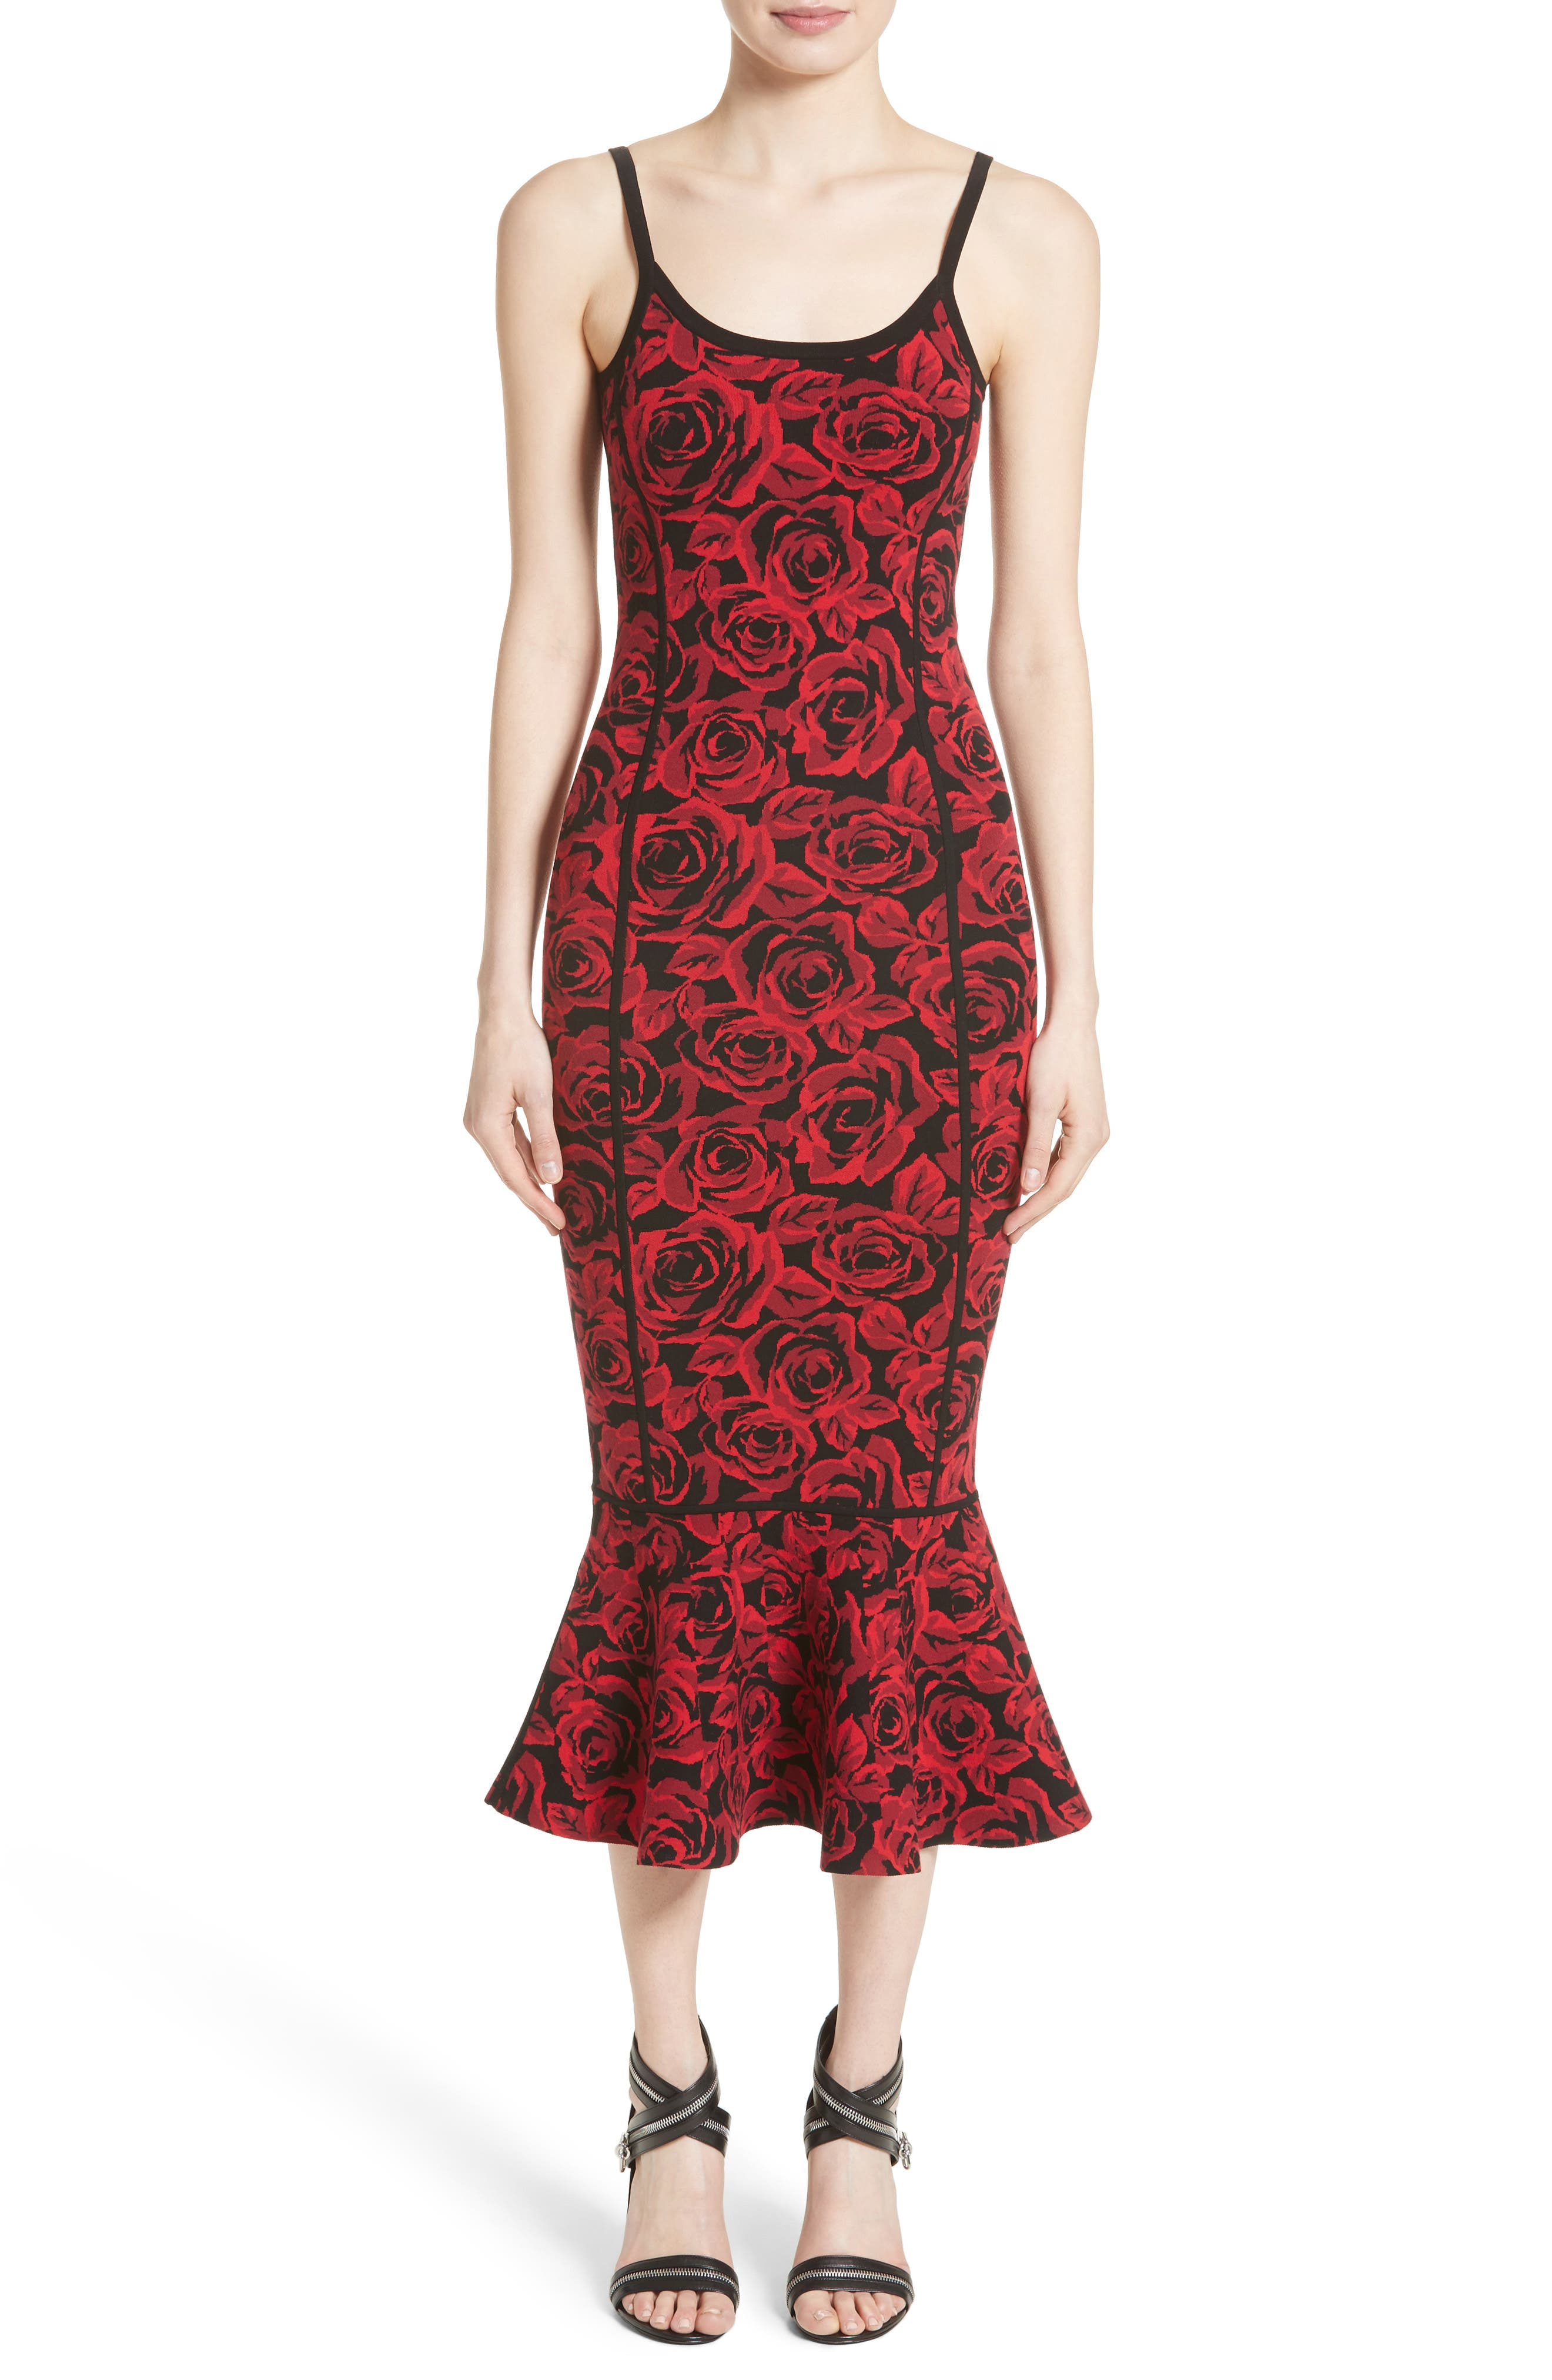 Michael Kors Stretch Rose Jacquard Tank Dress